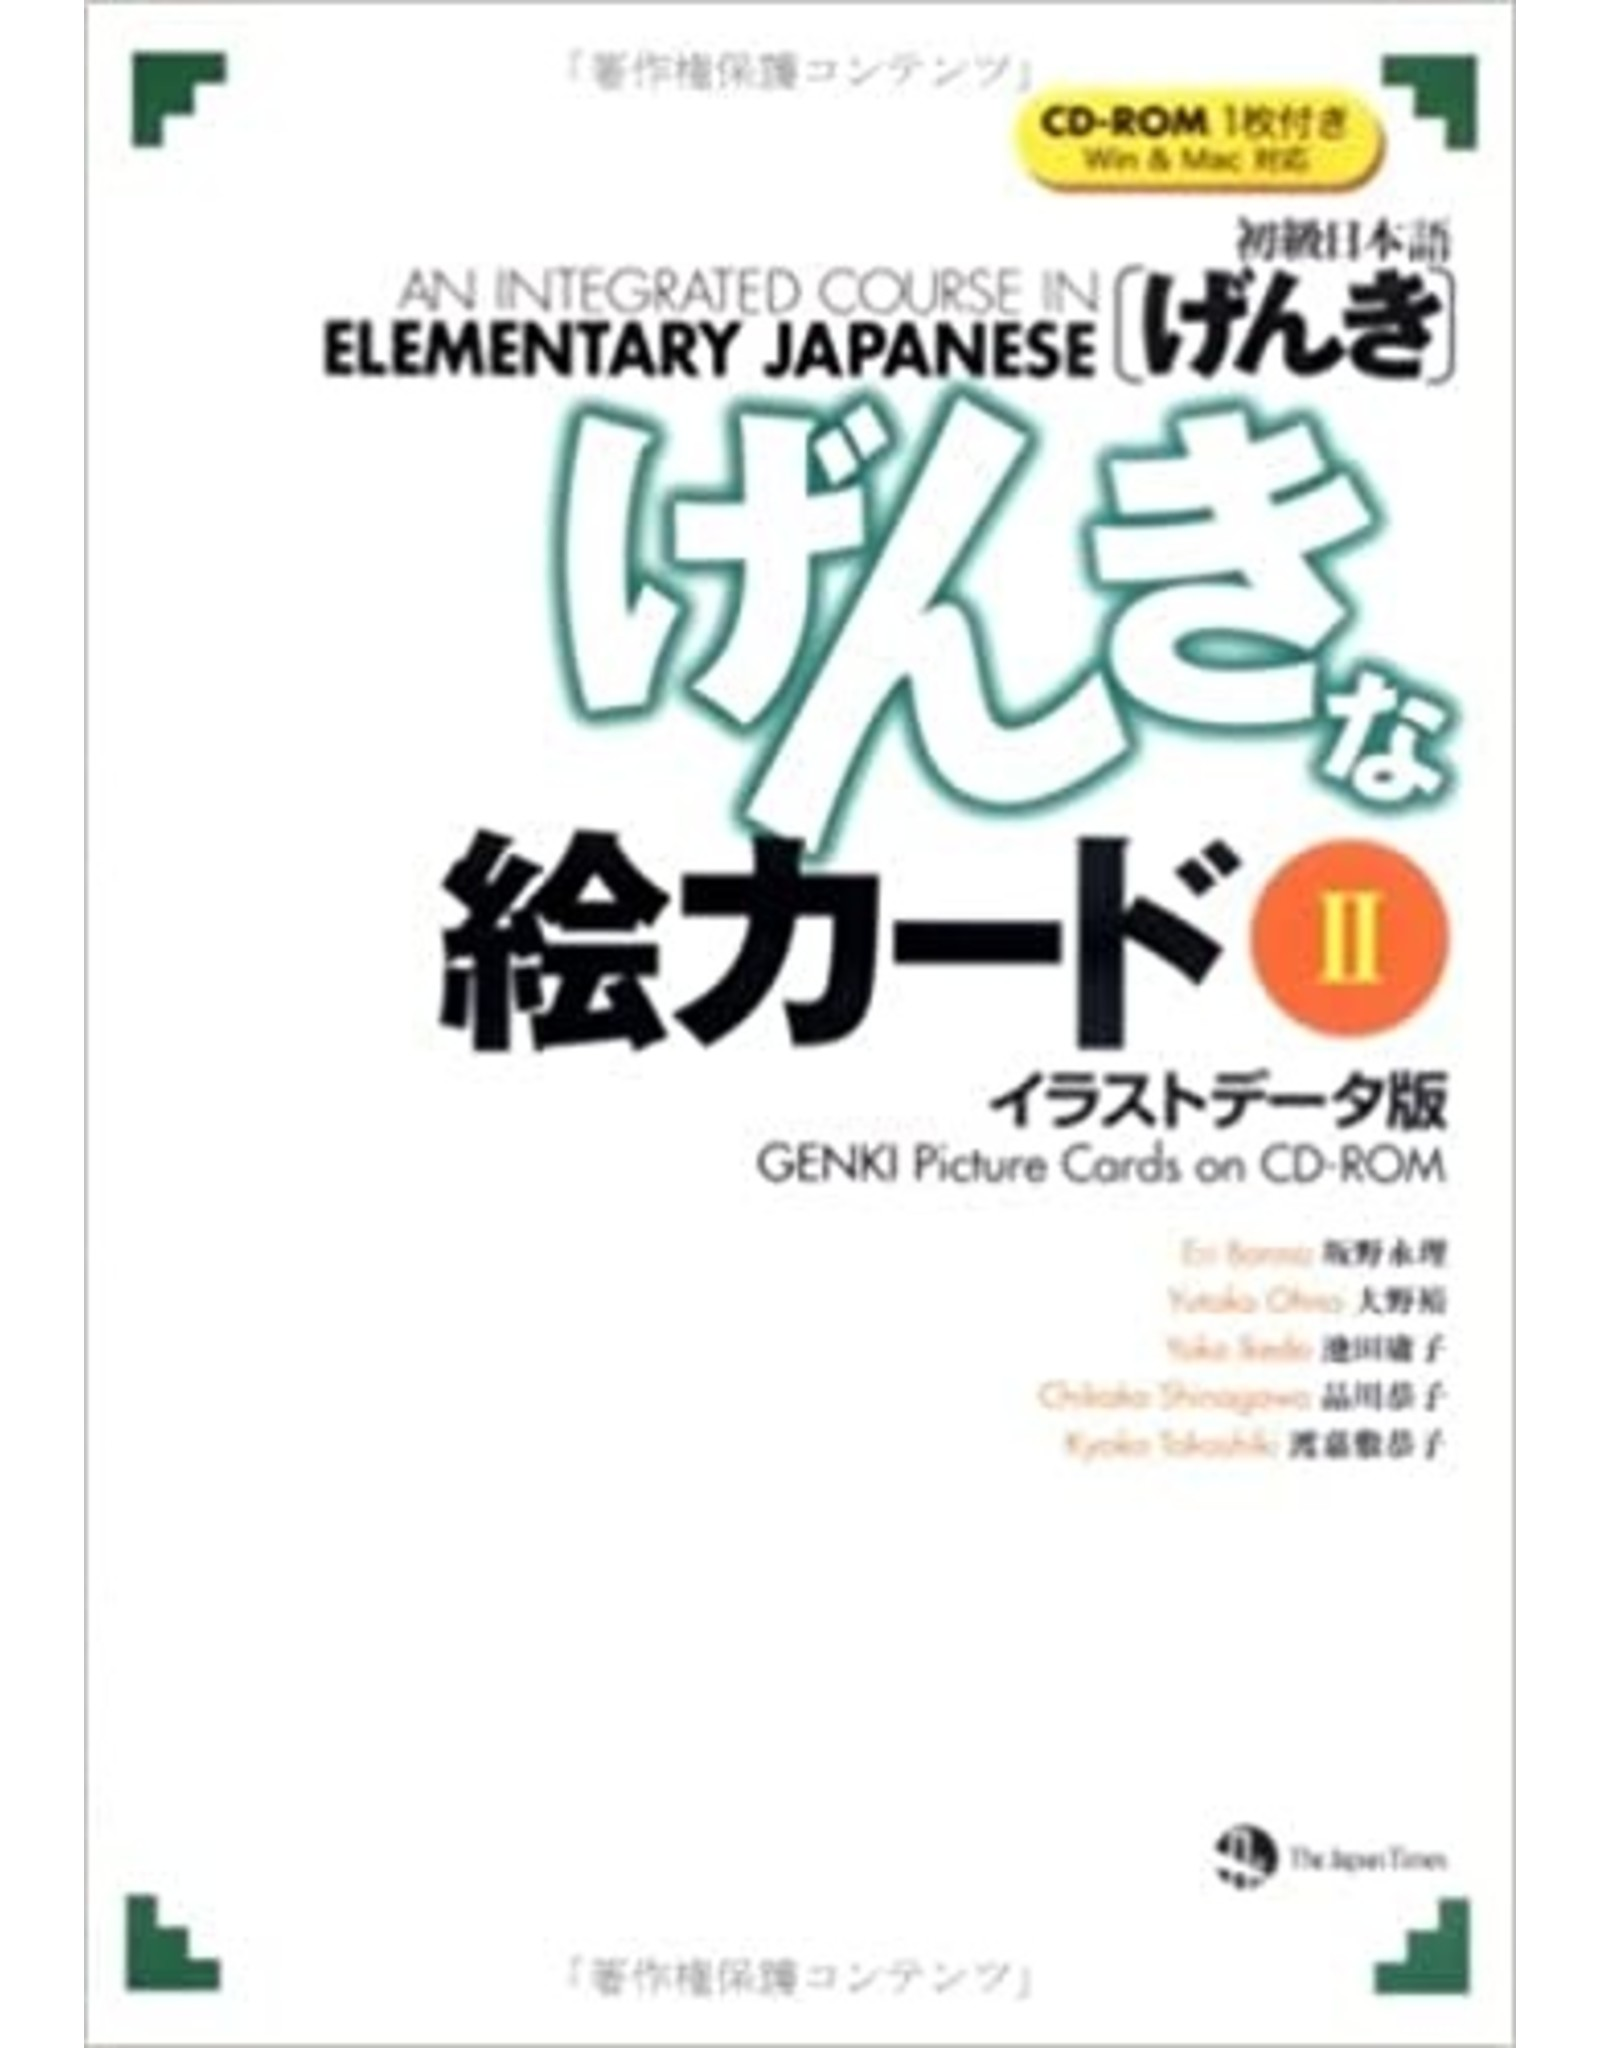 JAPAN TIMES GENKI NA E CARD (2) / CD-ROM 1ST ED. - GENKI PICTURE CARDS ON CD-ROM (2)